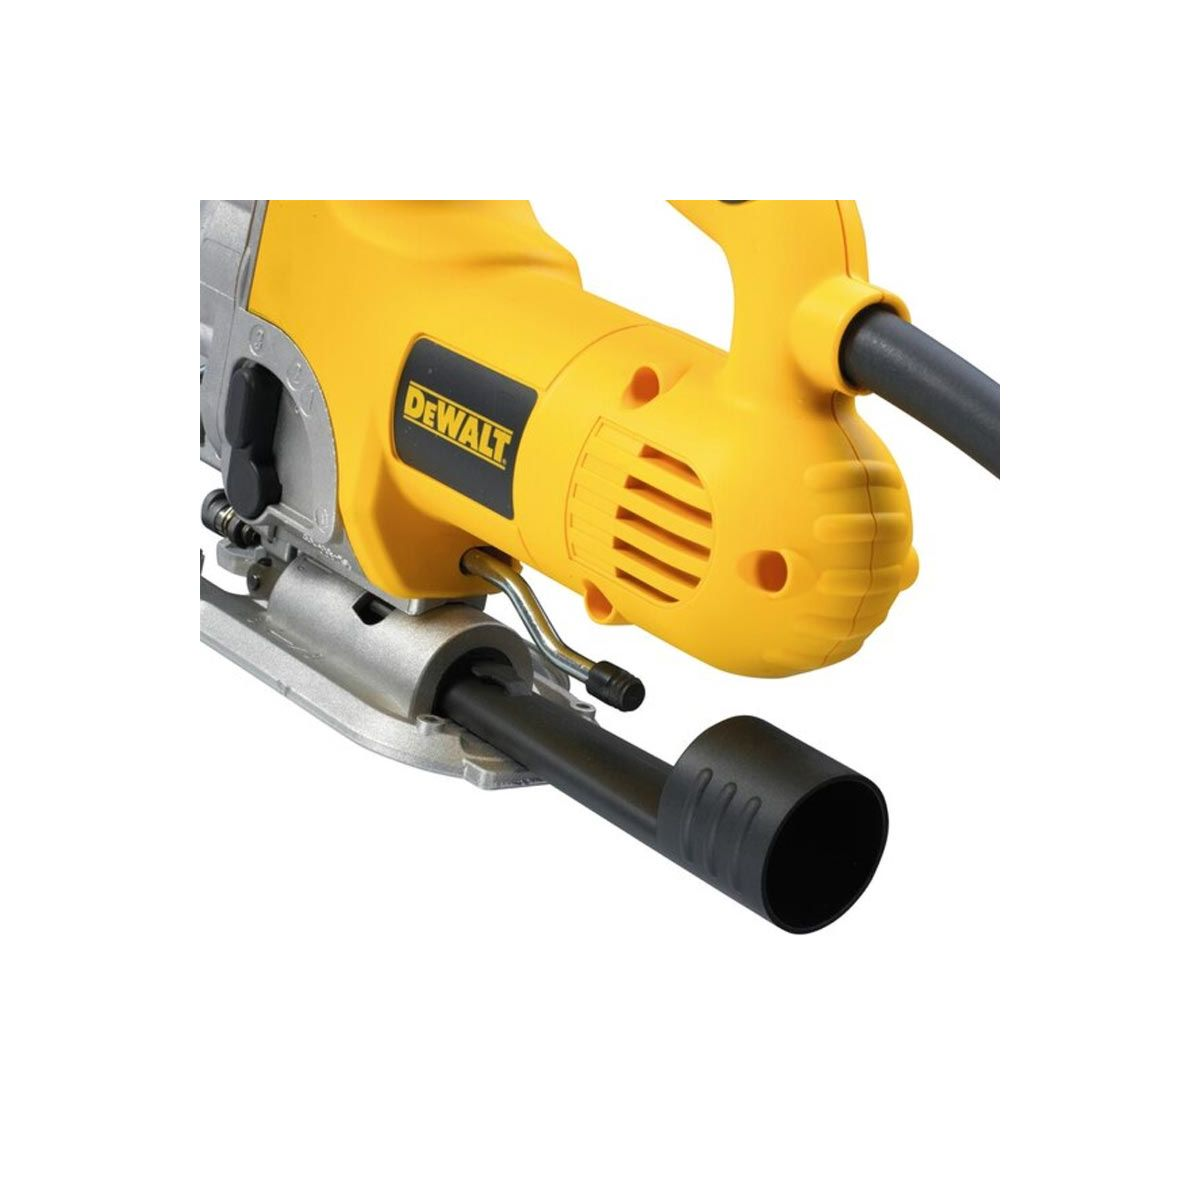 DEWALT DW331K-QS Sierra de calar de empuñadura cerrada (701W)